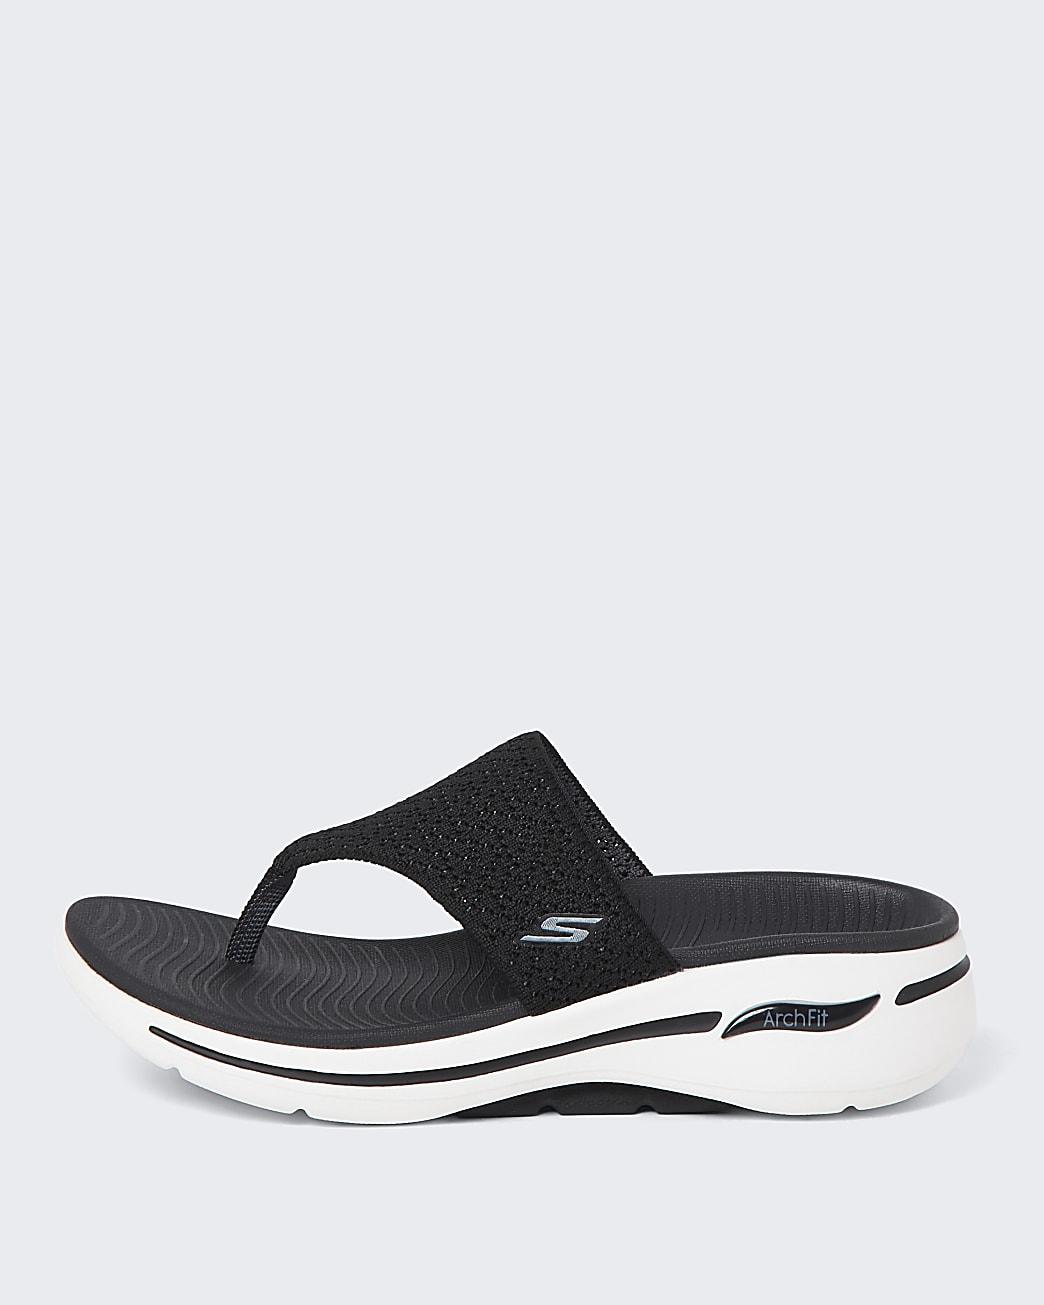 Skechers black flip flop trainers